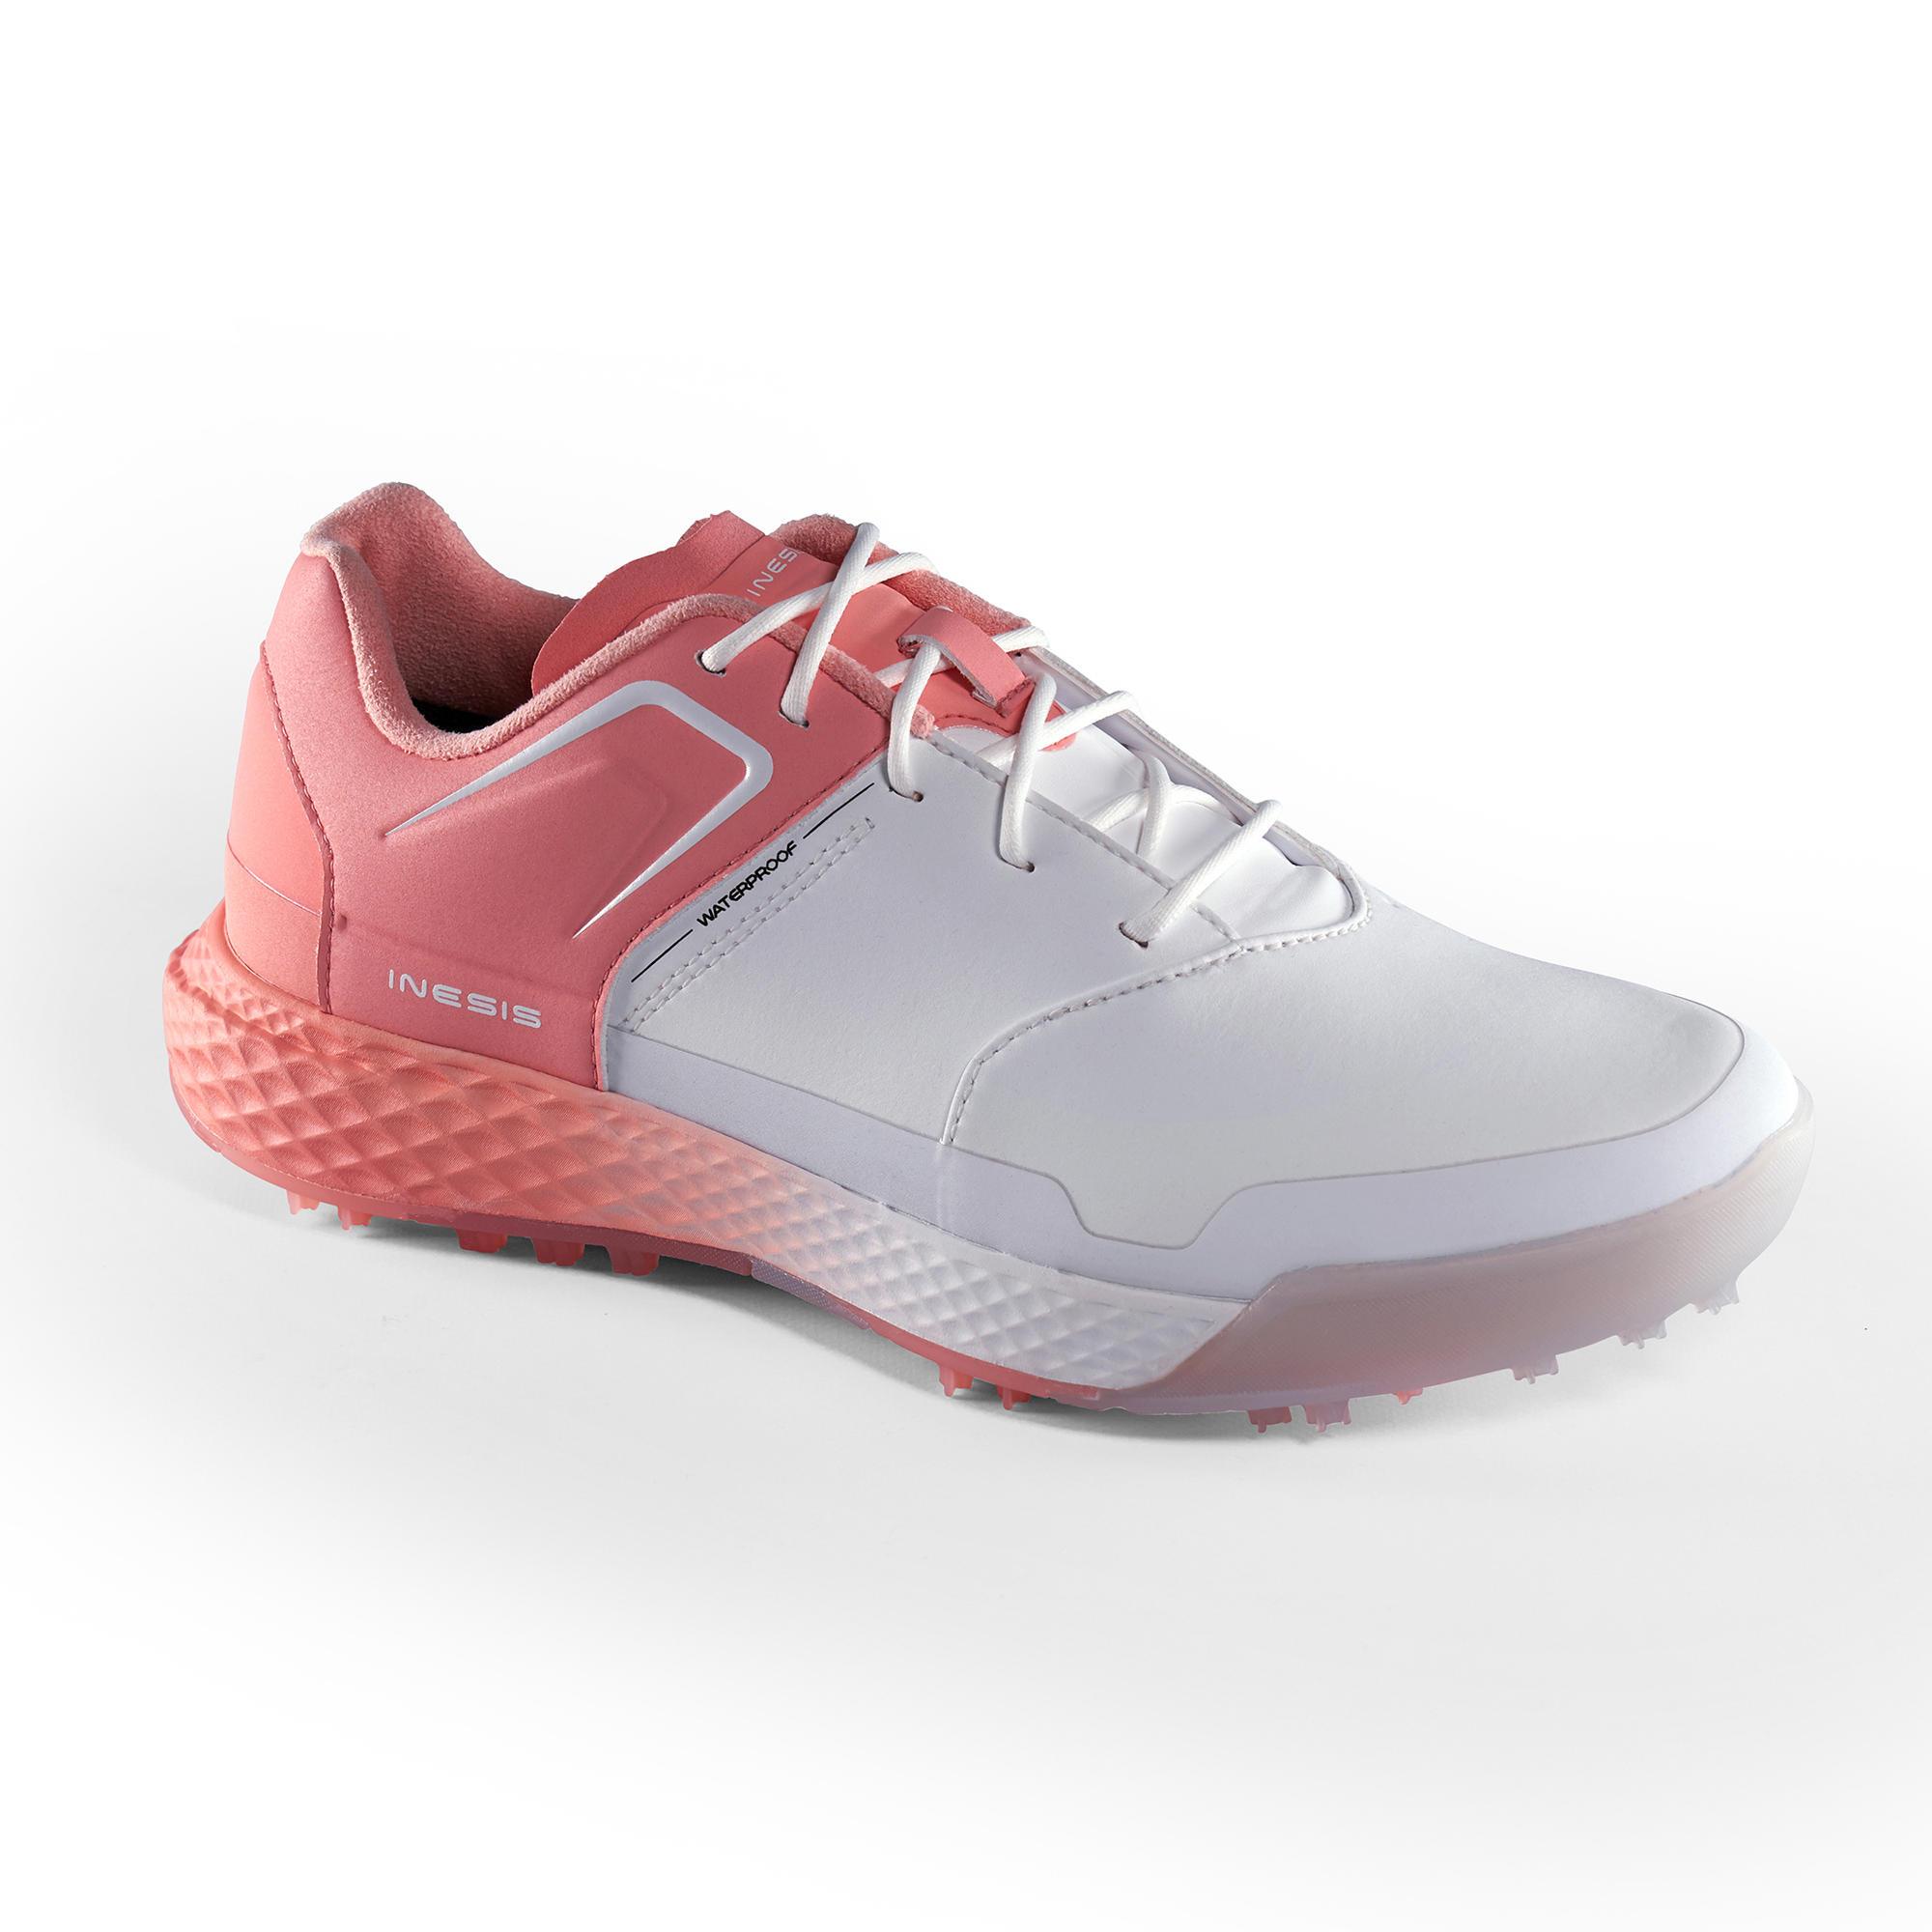 dff1c114cceea Chaussures de golf | Decathlon